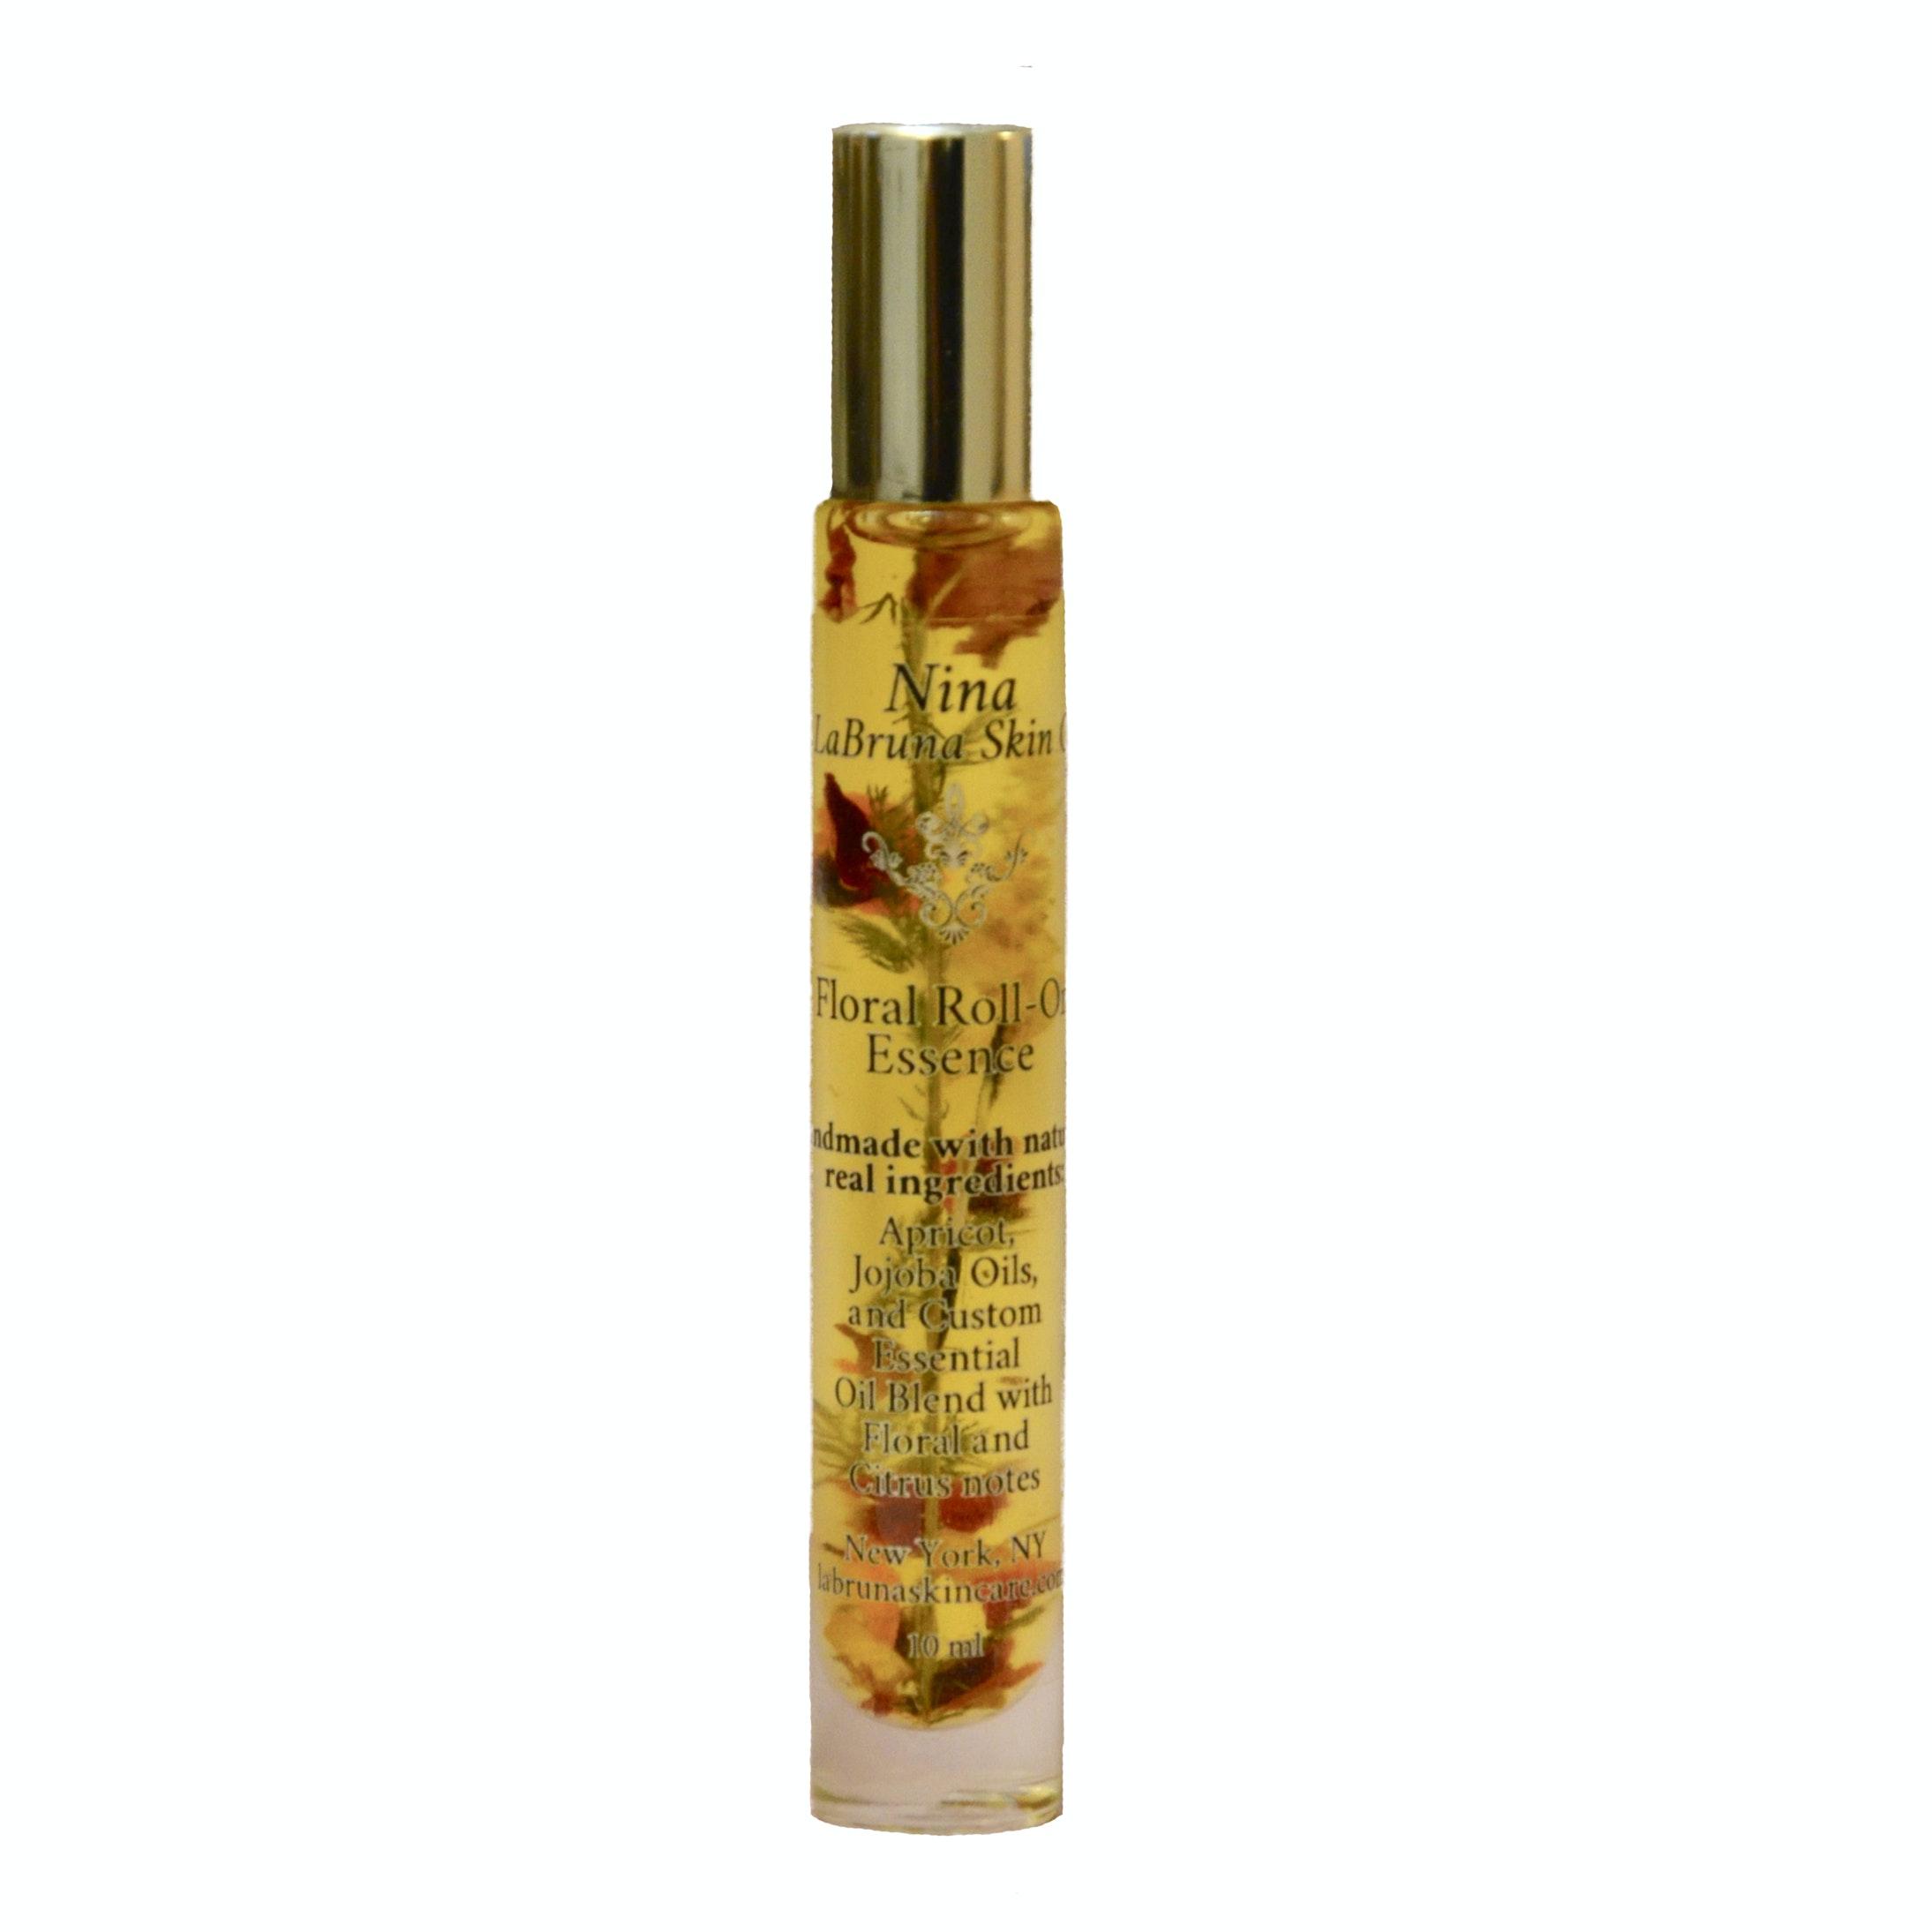 LaBruna™ Skincare Floral Roll-on Essence